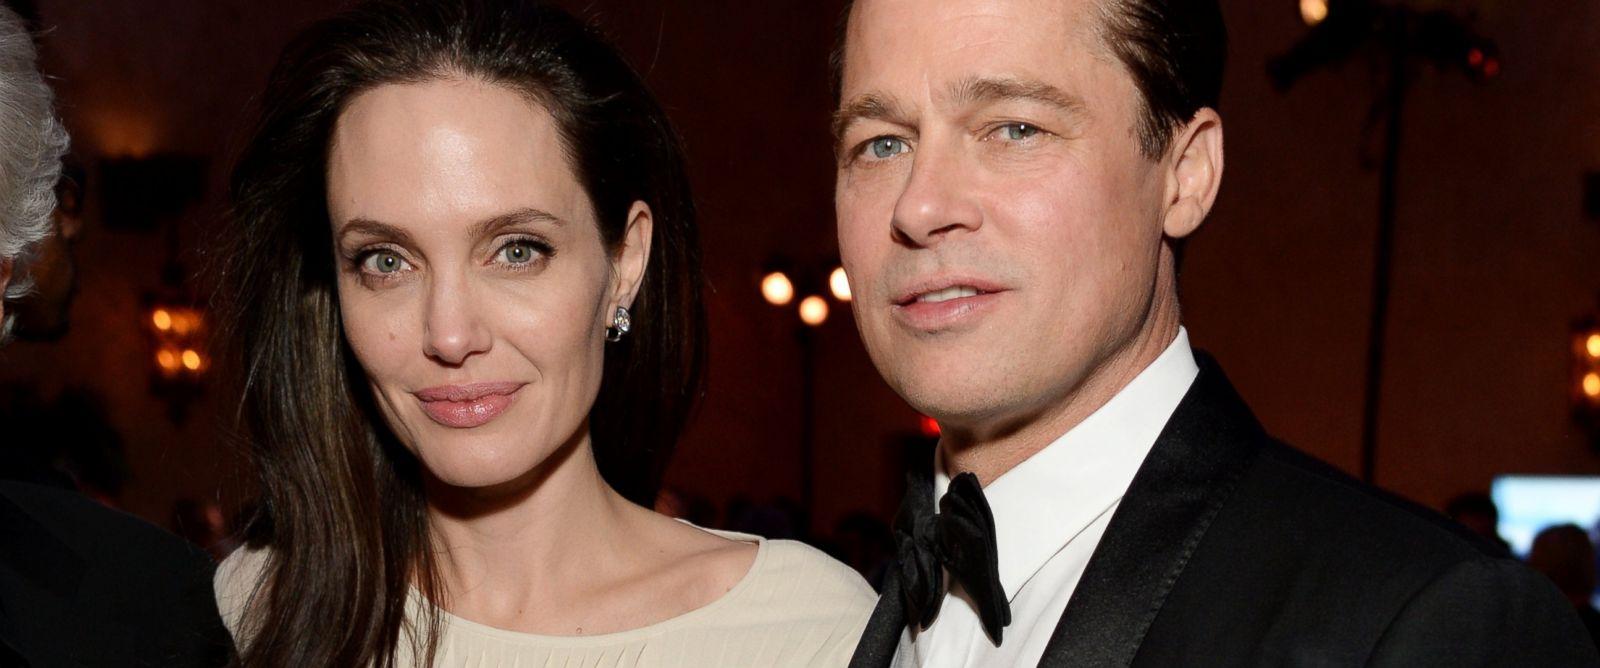 Brad Pitt And Angelina Jolie Sex Scene 113